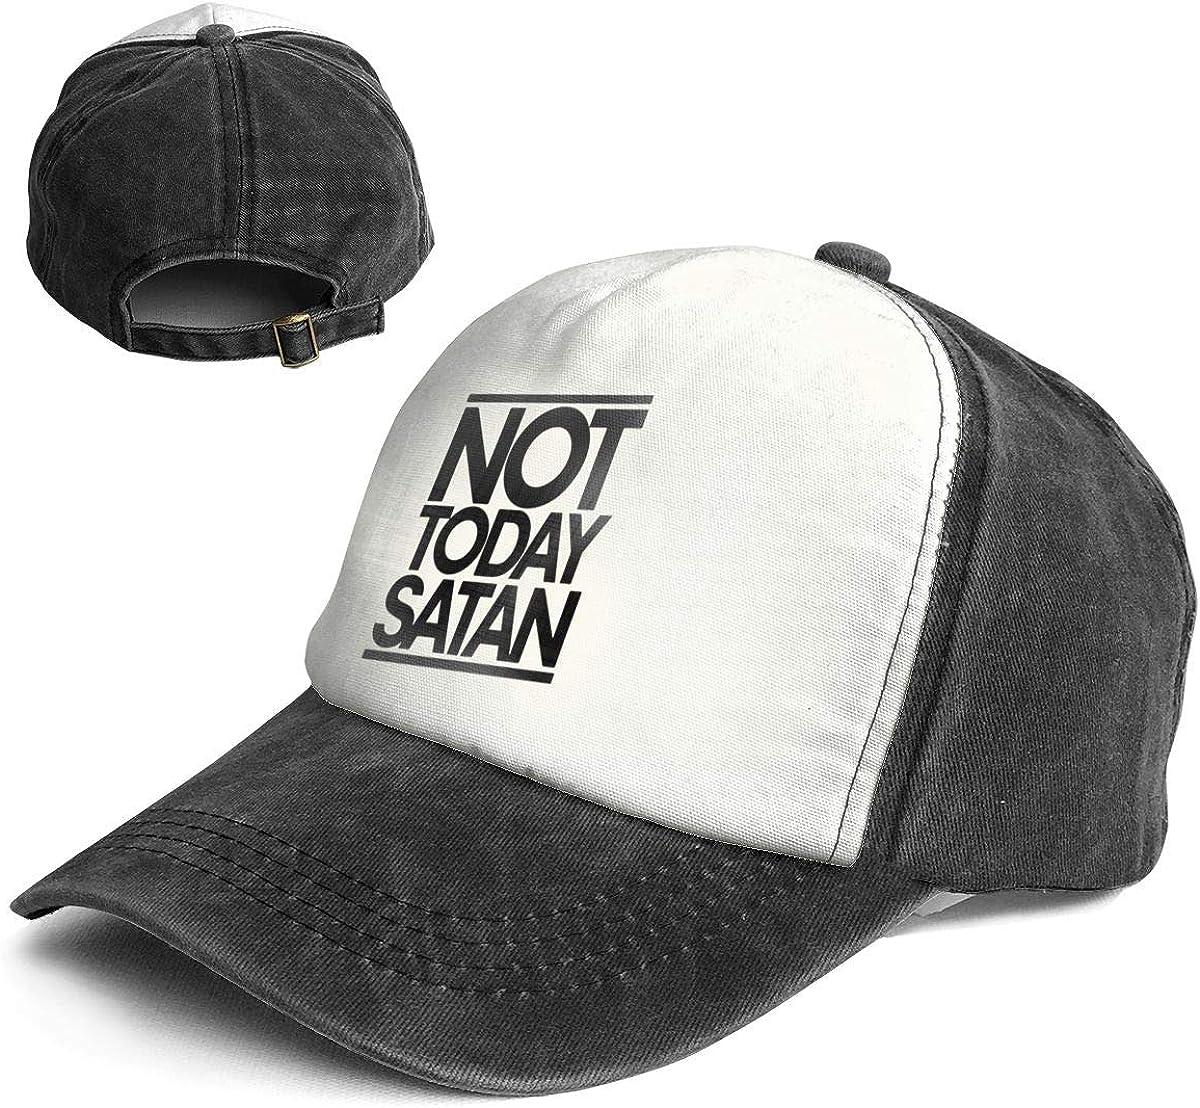 Fashion Vintage Hat Not Today Satan Adjustable Dad Hat Baseball Cowboy Cap